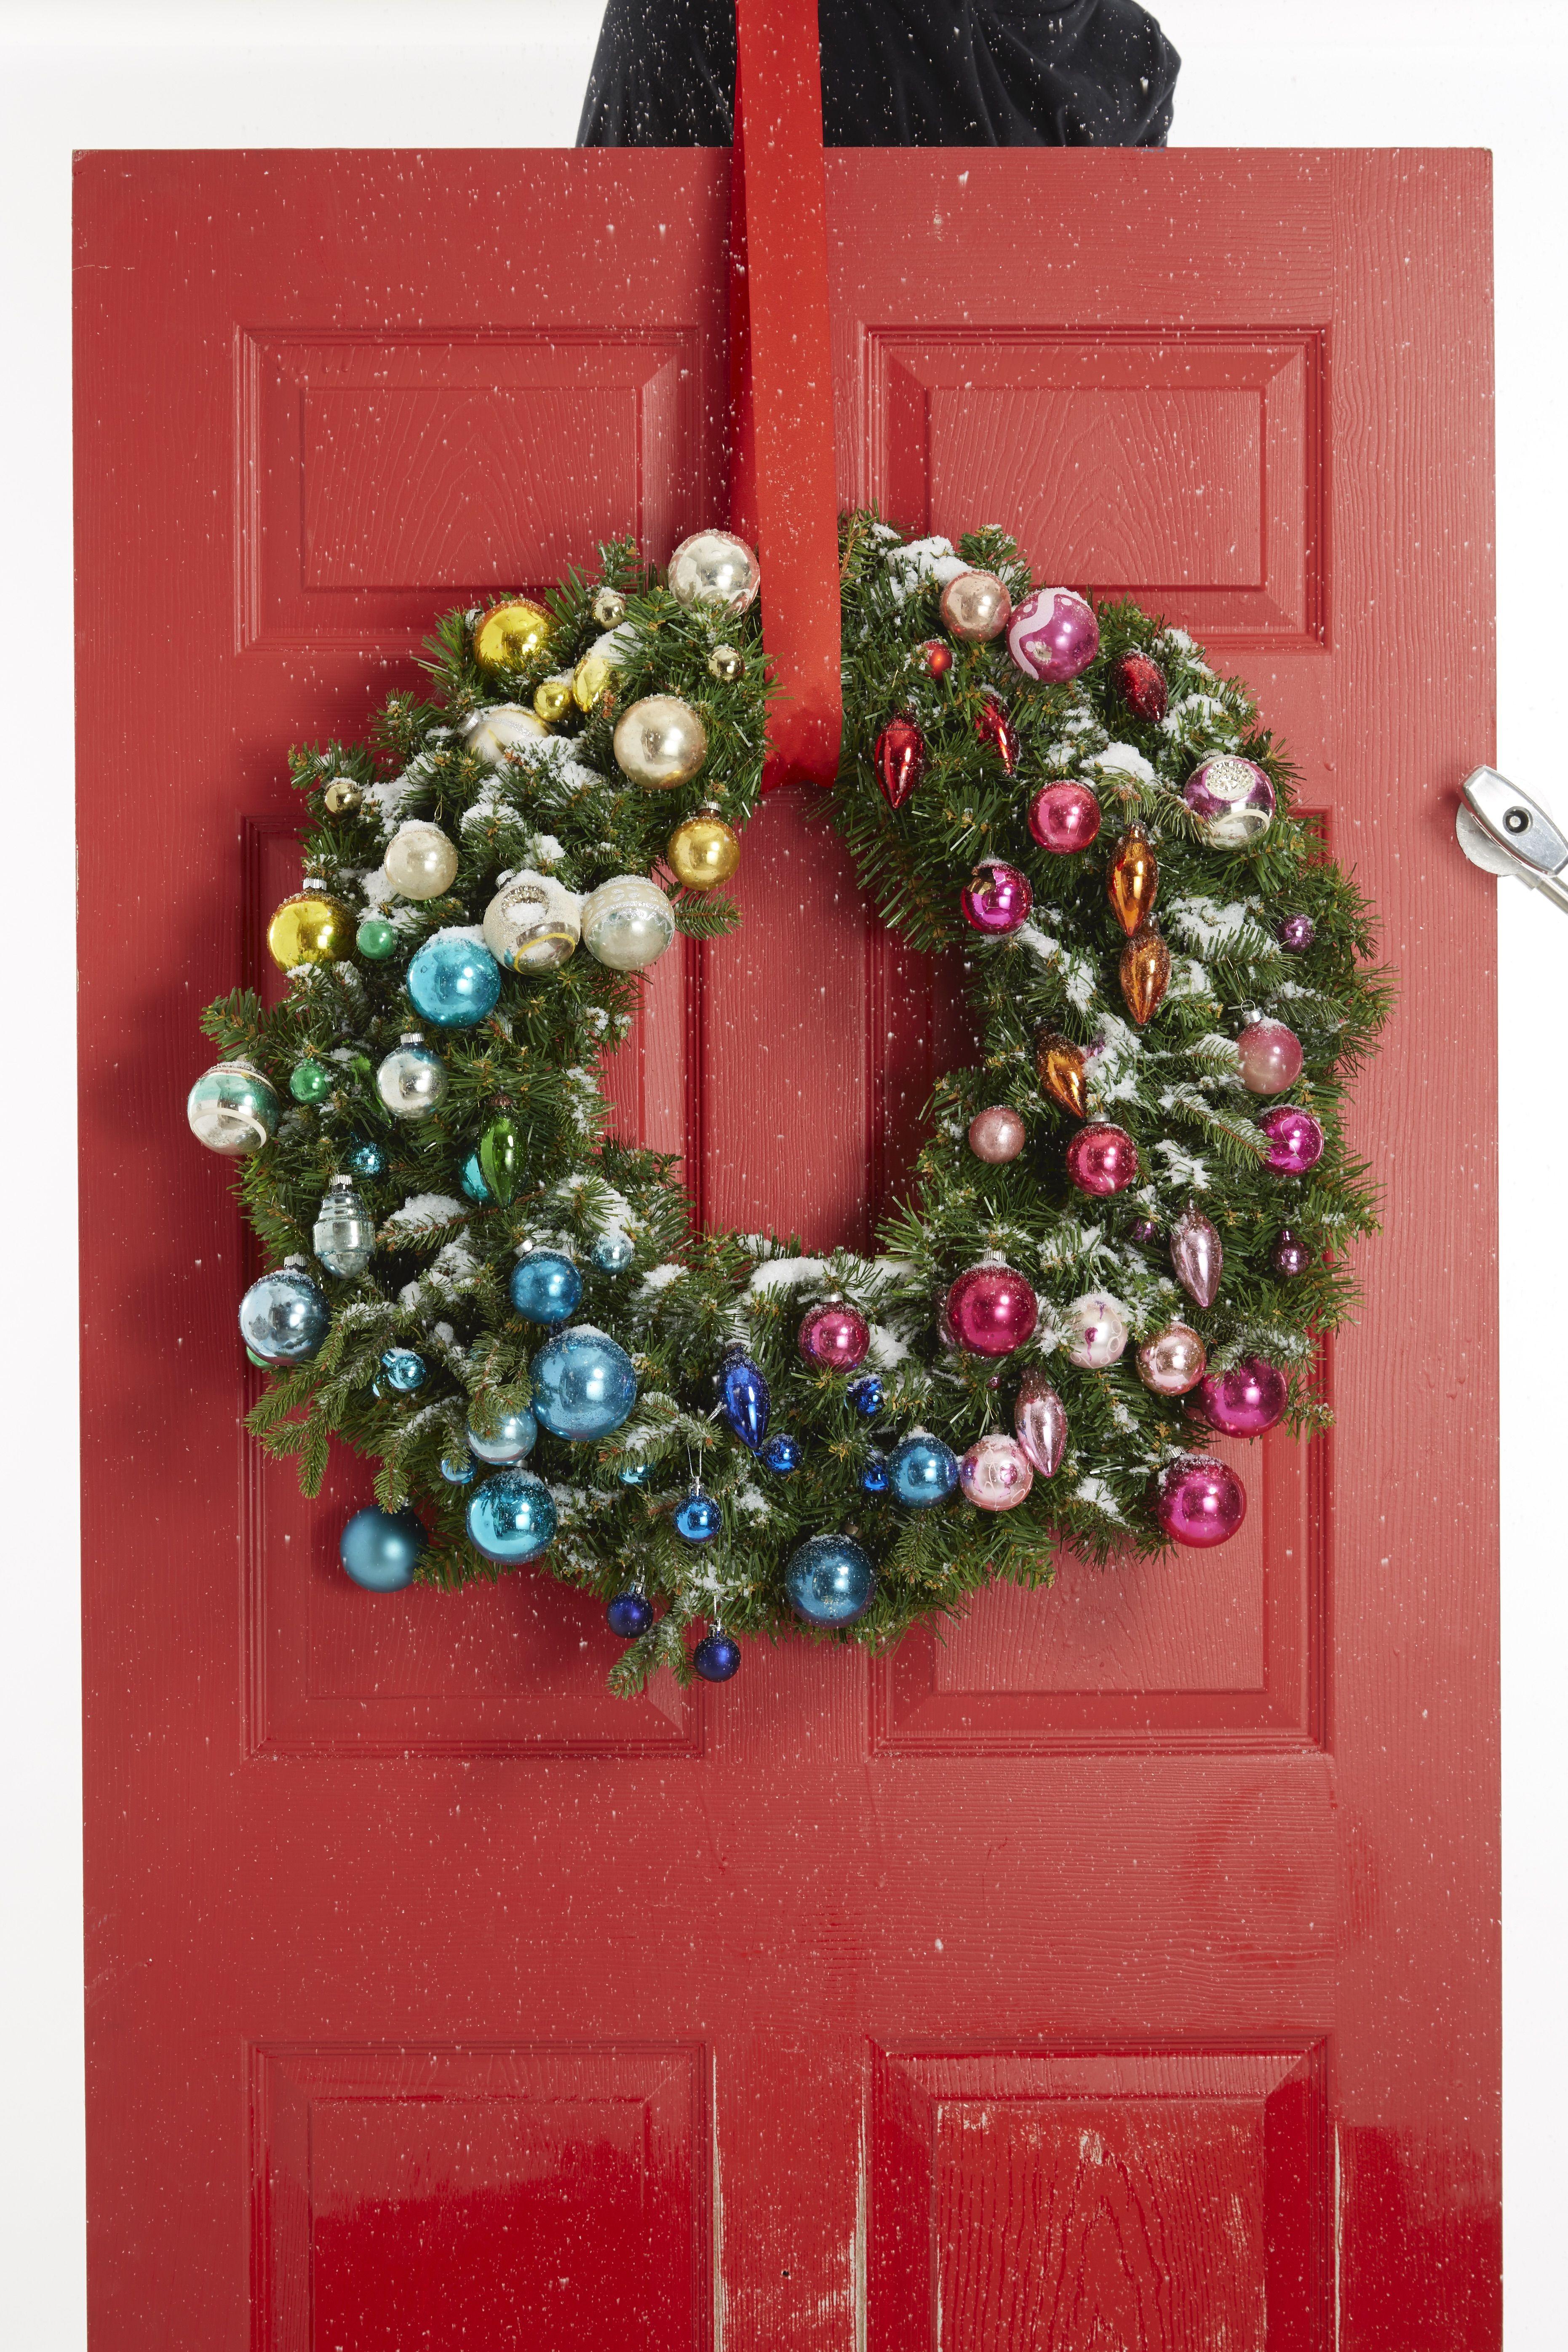 Christmas Light Garland with Balls Ornaments Green Garland Xmas Door Party Decor